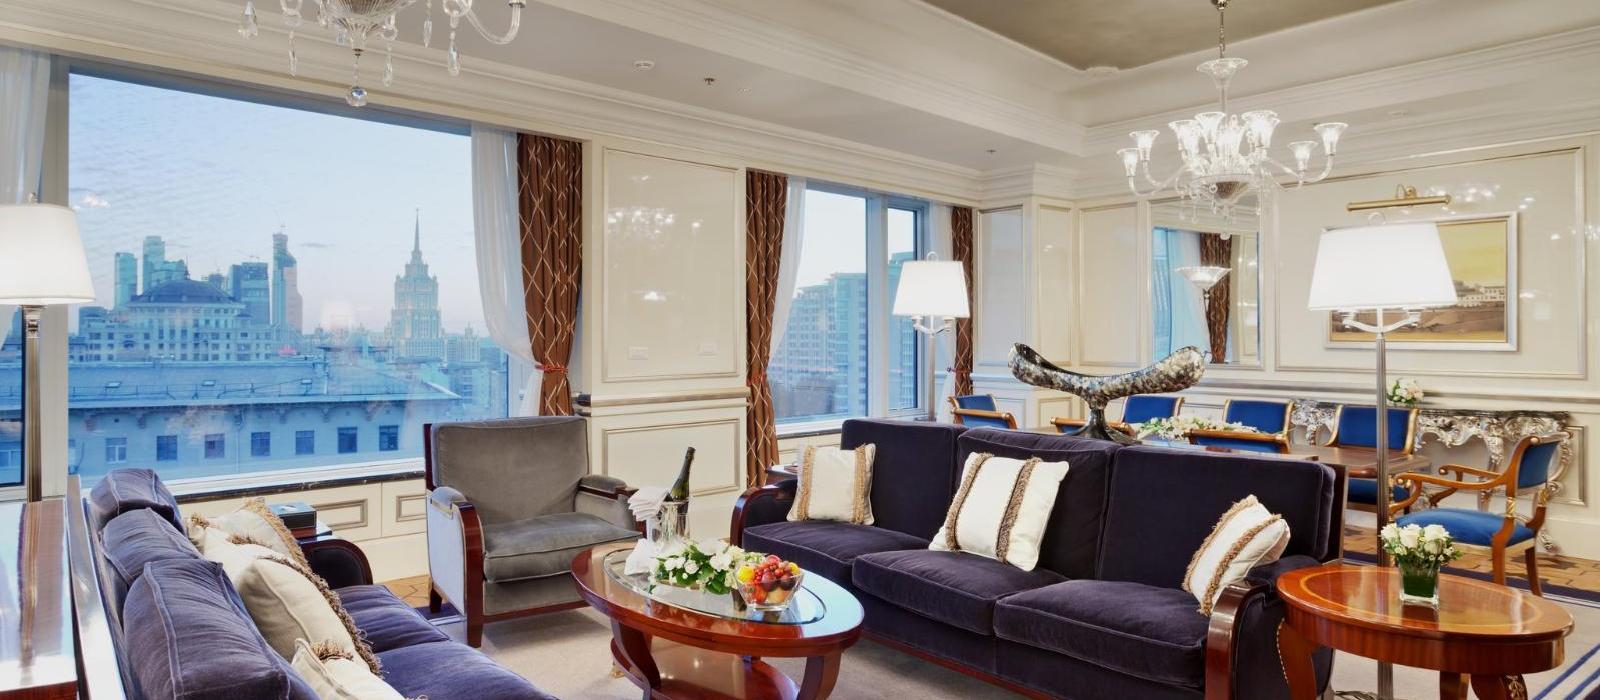 乐天莫斯科酒店(Lotte Hotel Moscow) 图片  www.lhw.cn